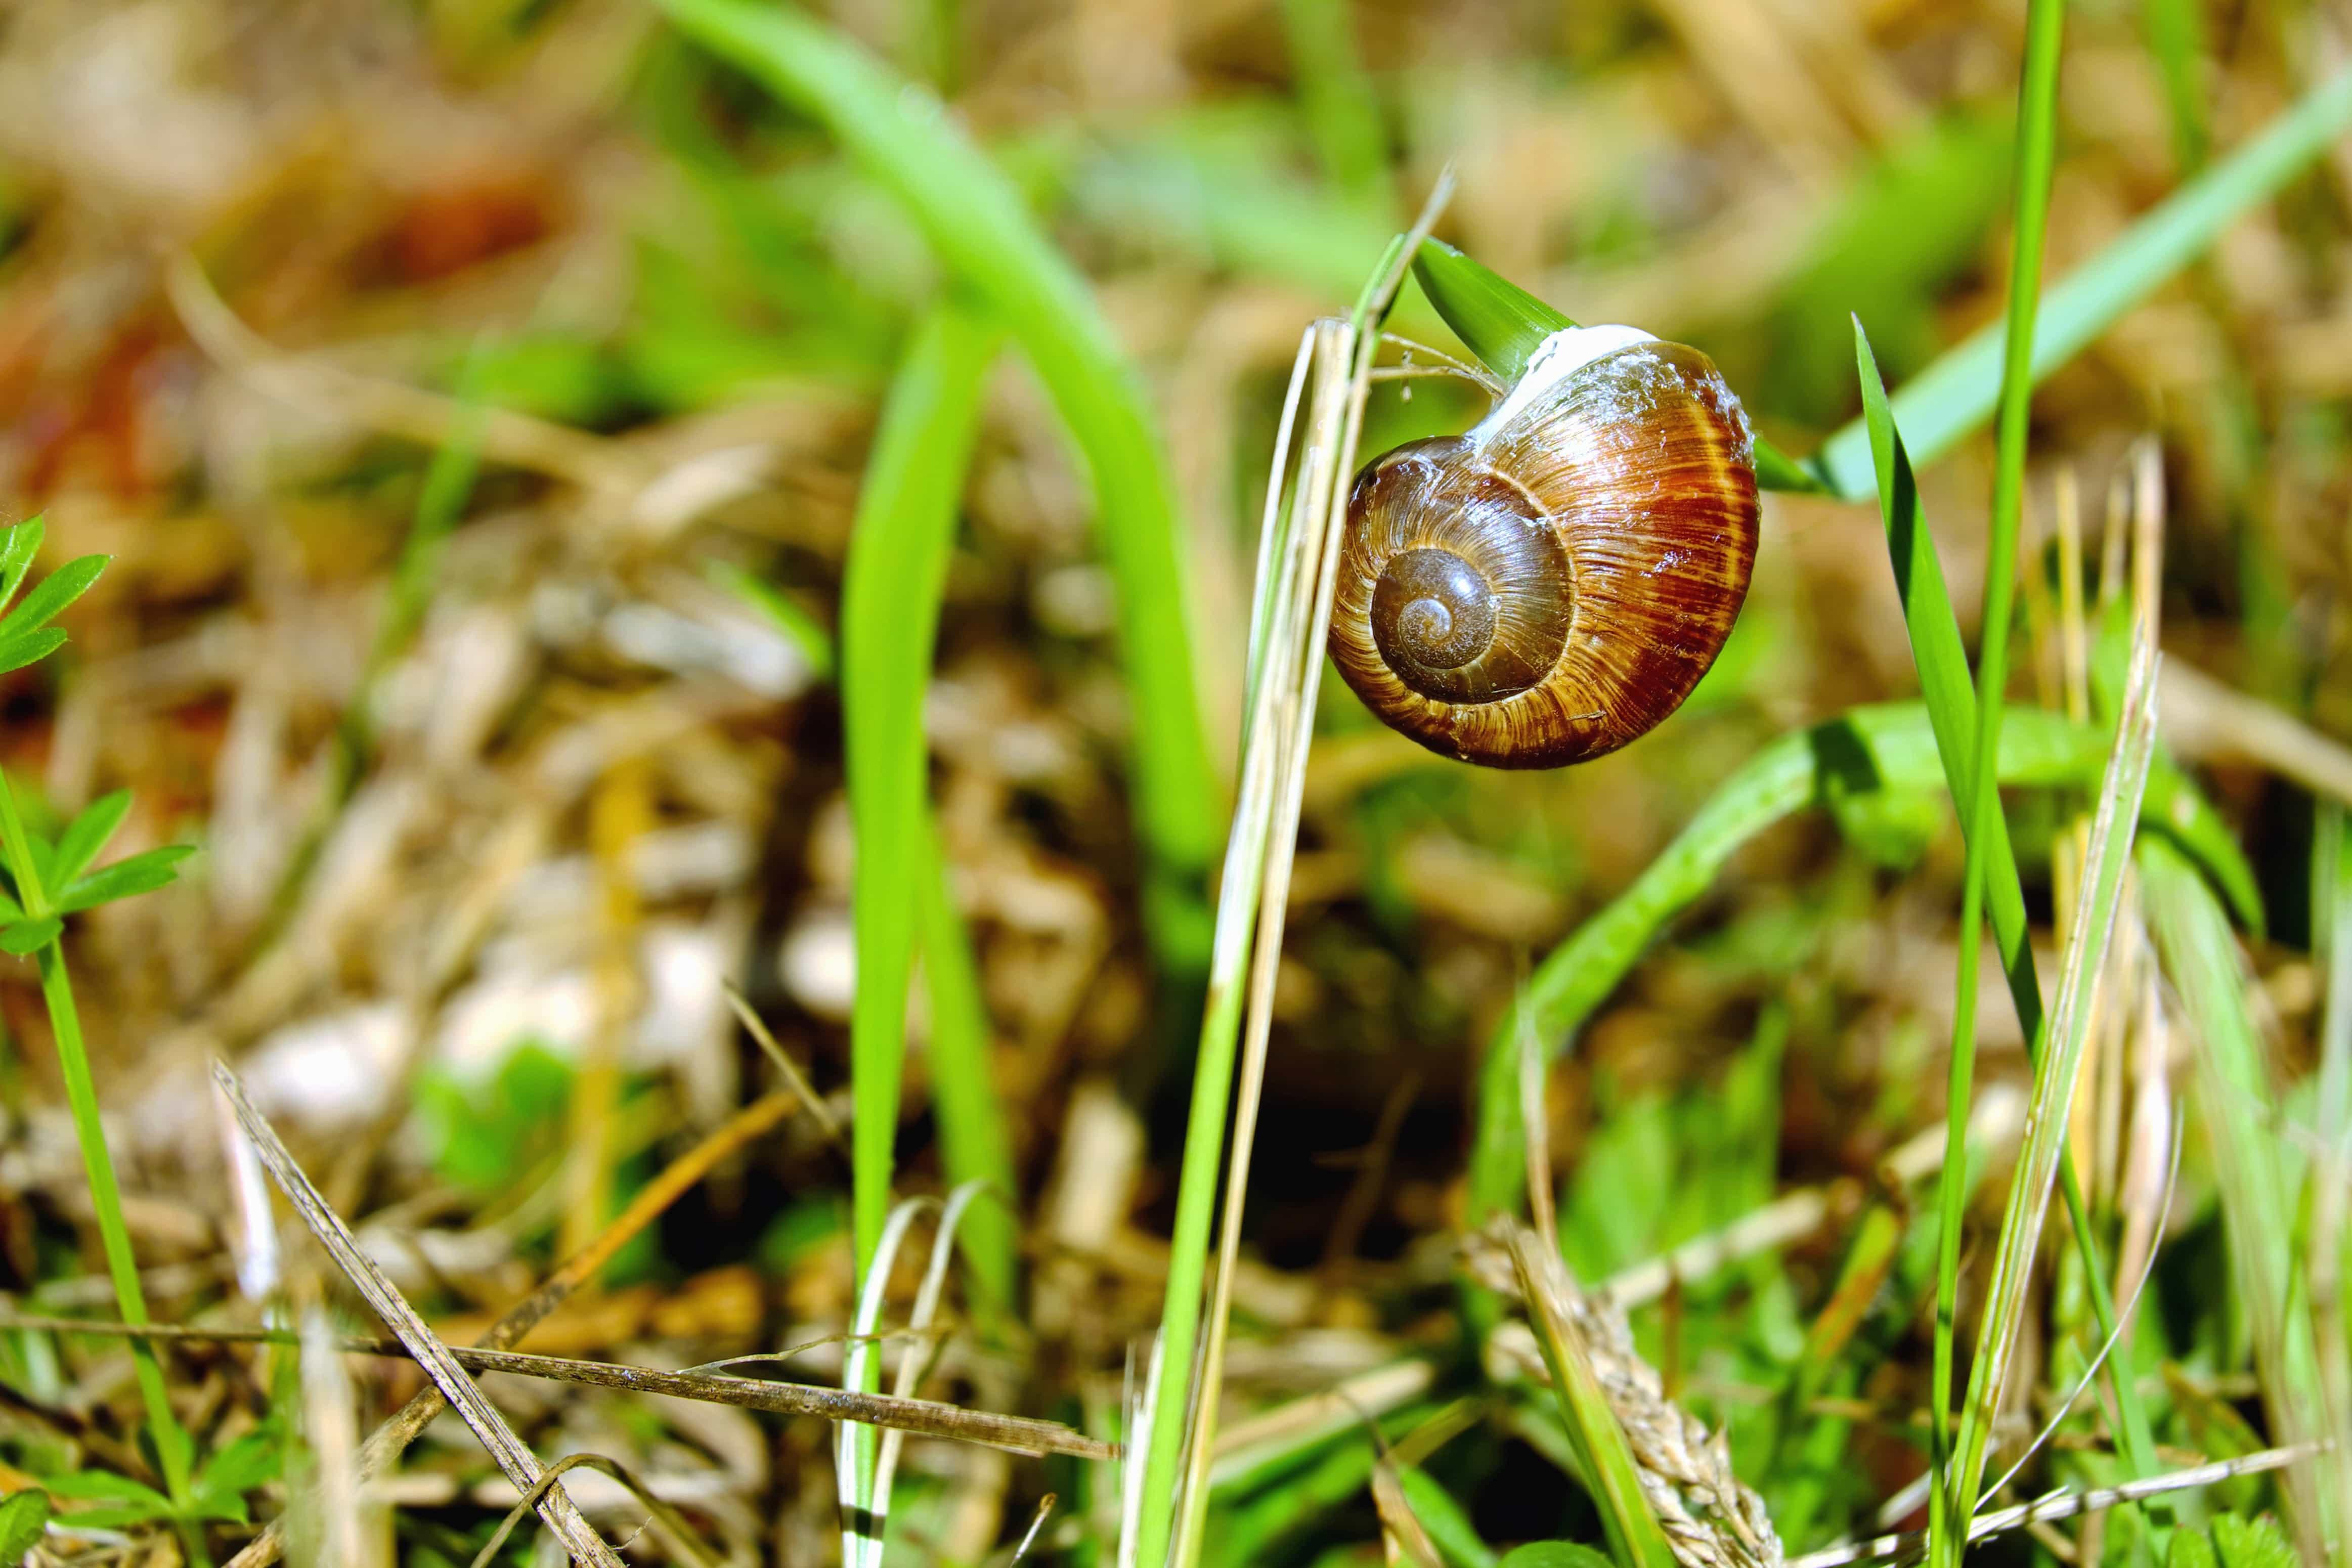 Free picture: grass, leaf, nature, flora, garden, snail, mollusk